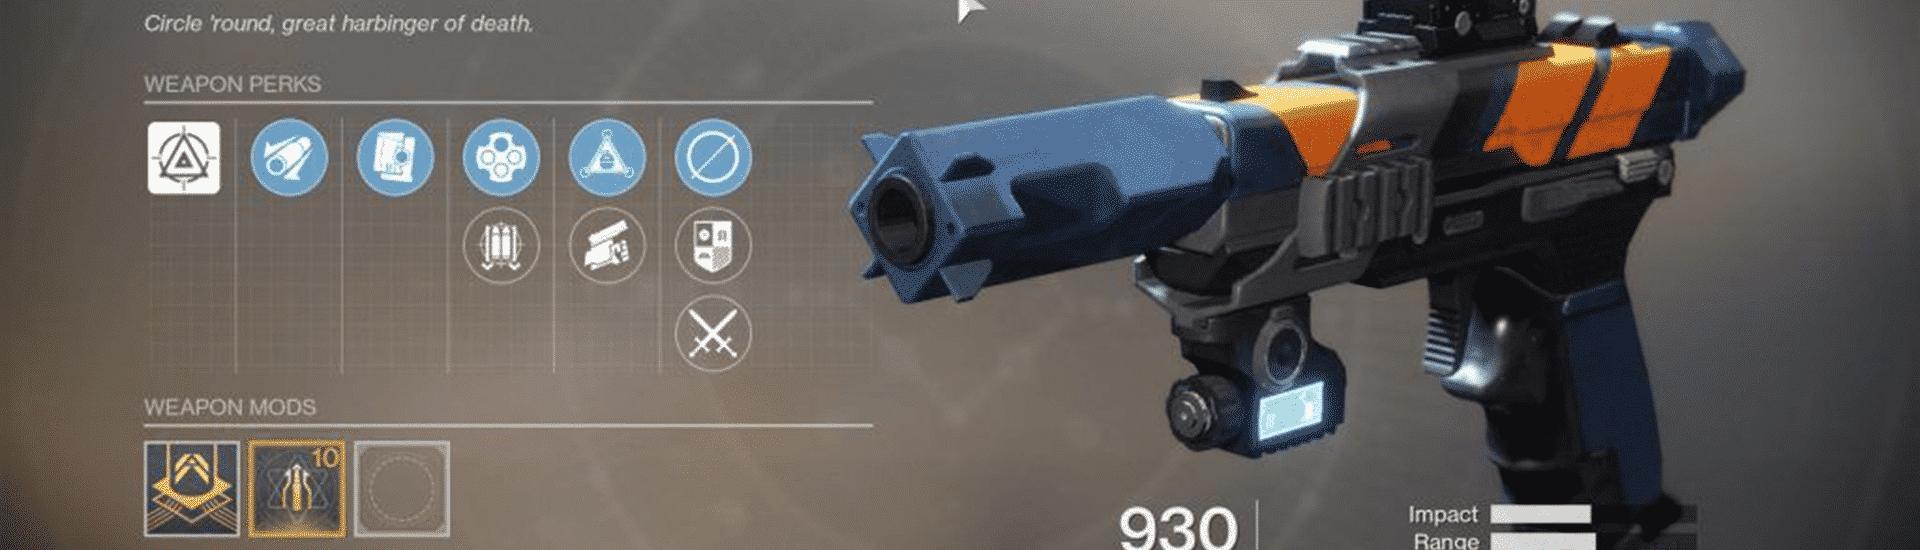 buzzard carryy recov sidearm